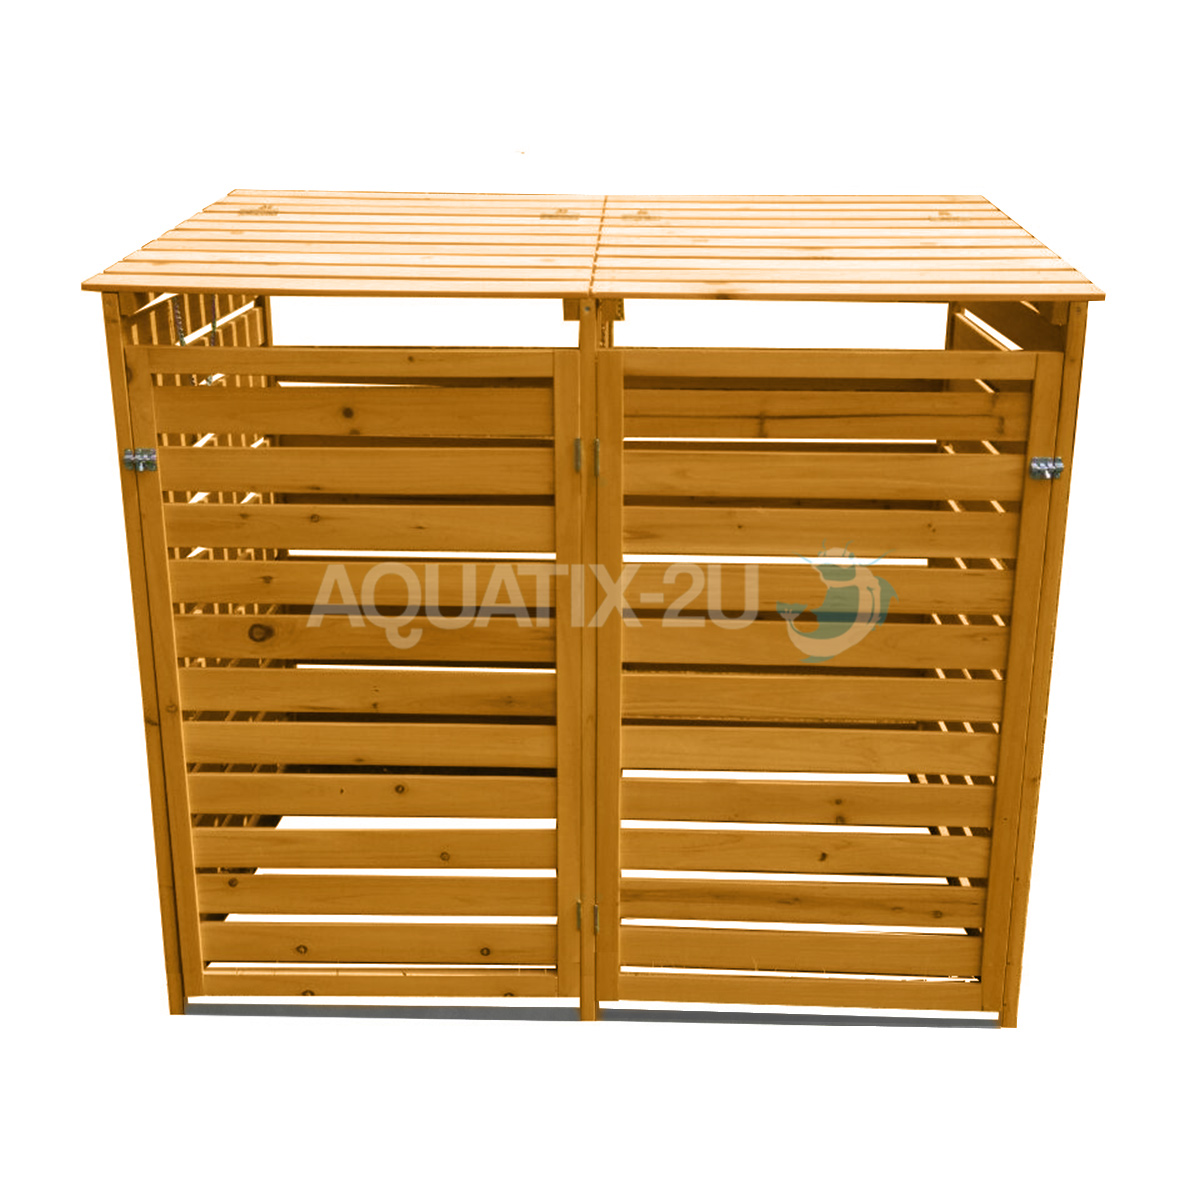 Double Wooden Wheelie Bin Store Outdoor Cupboard For